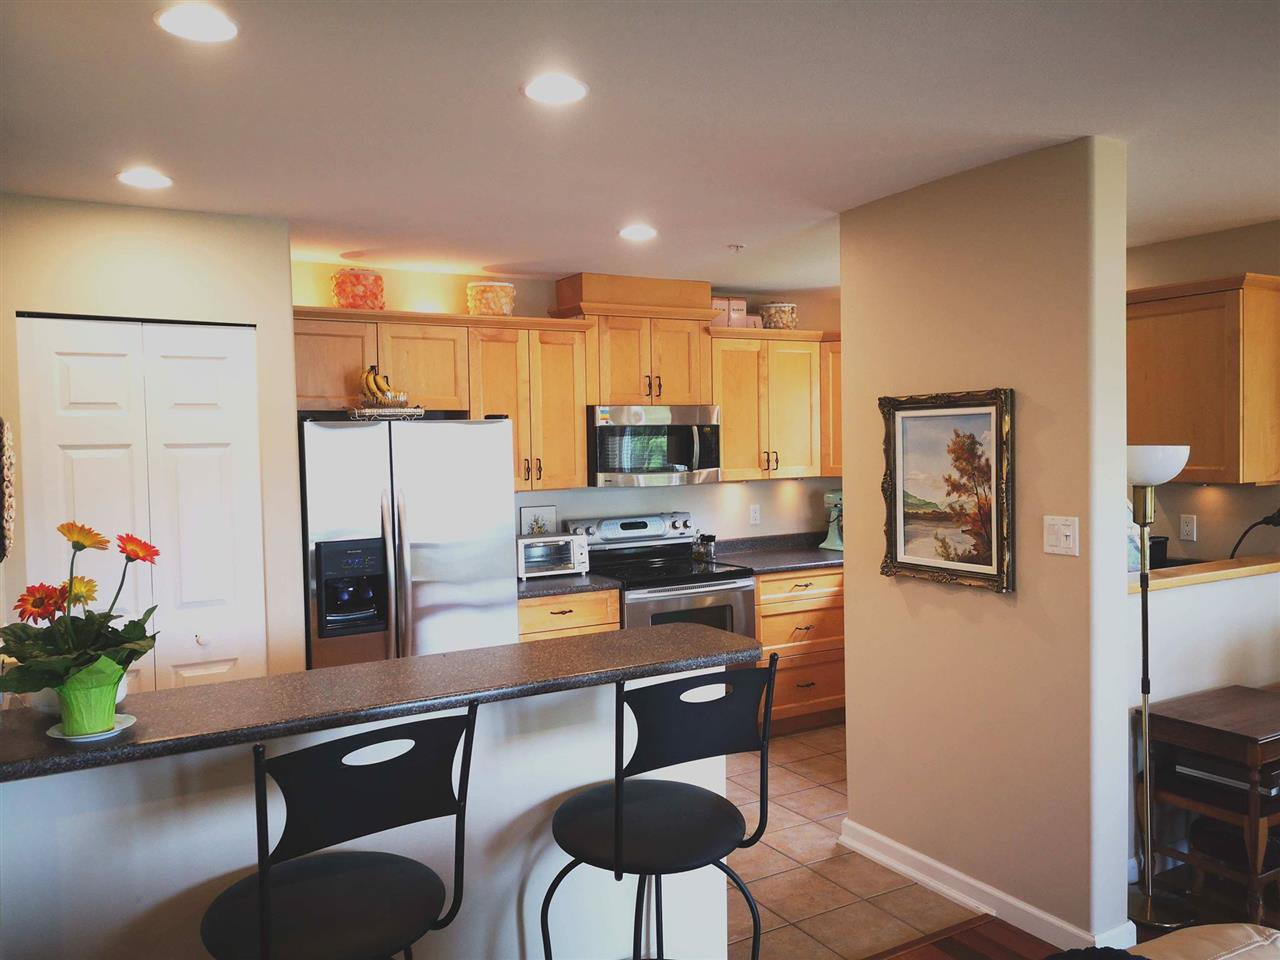 "Photo 5: Photos: W201 5780 TRAIL Avenue in Sechelt: Sechelt District Condo for sale in ""THE BLUFF"" (Sunshine Coast)  : MLS®# R2409652"